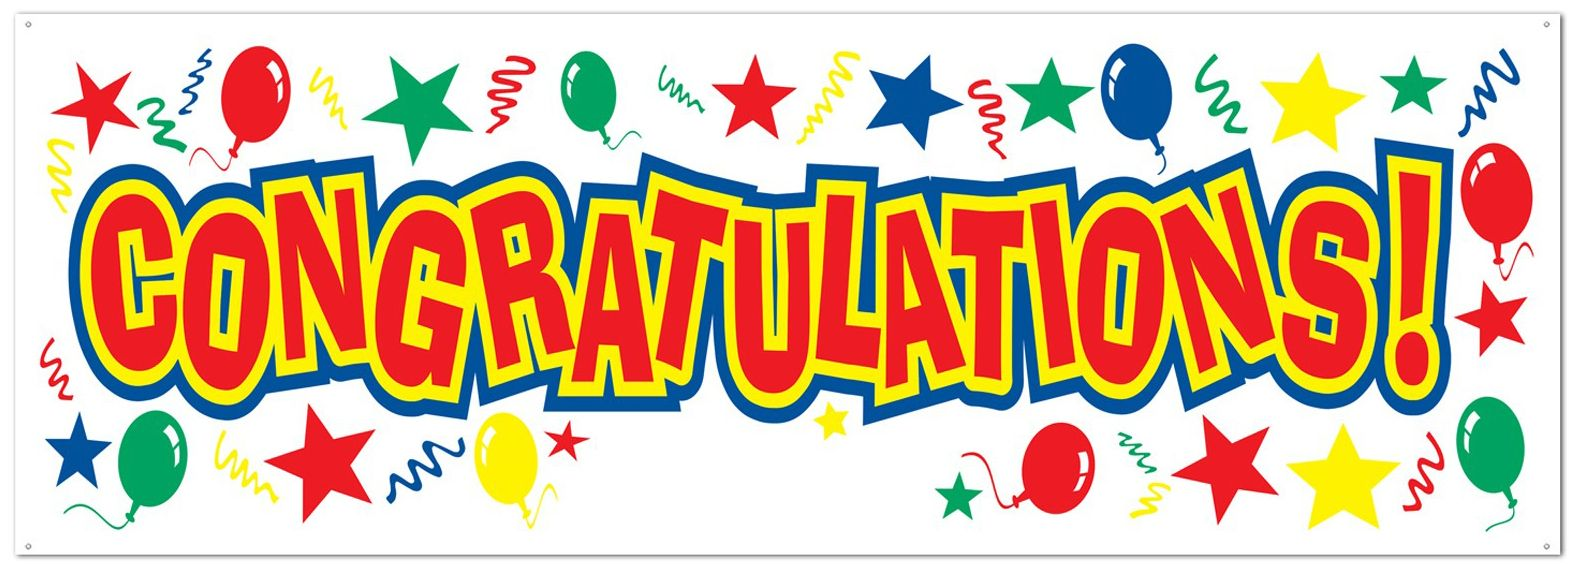 congratulation banners free.